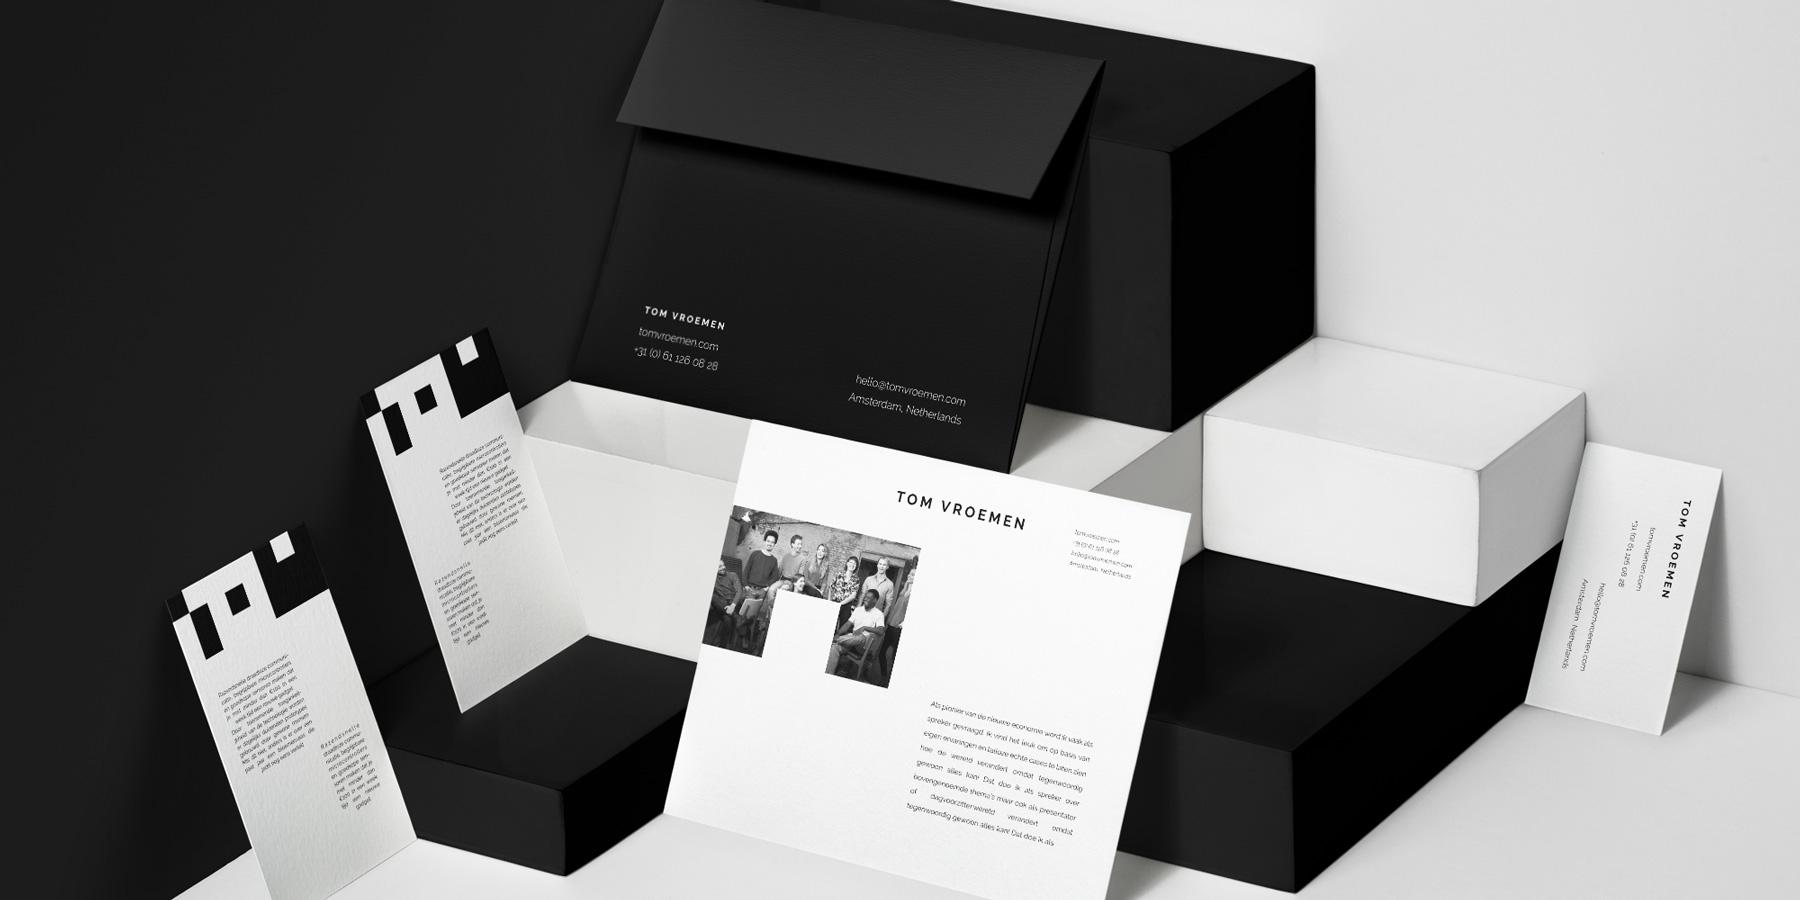 Tom Vroemen / Dutchy Design / Branding & Design Portfolio